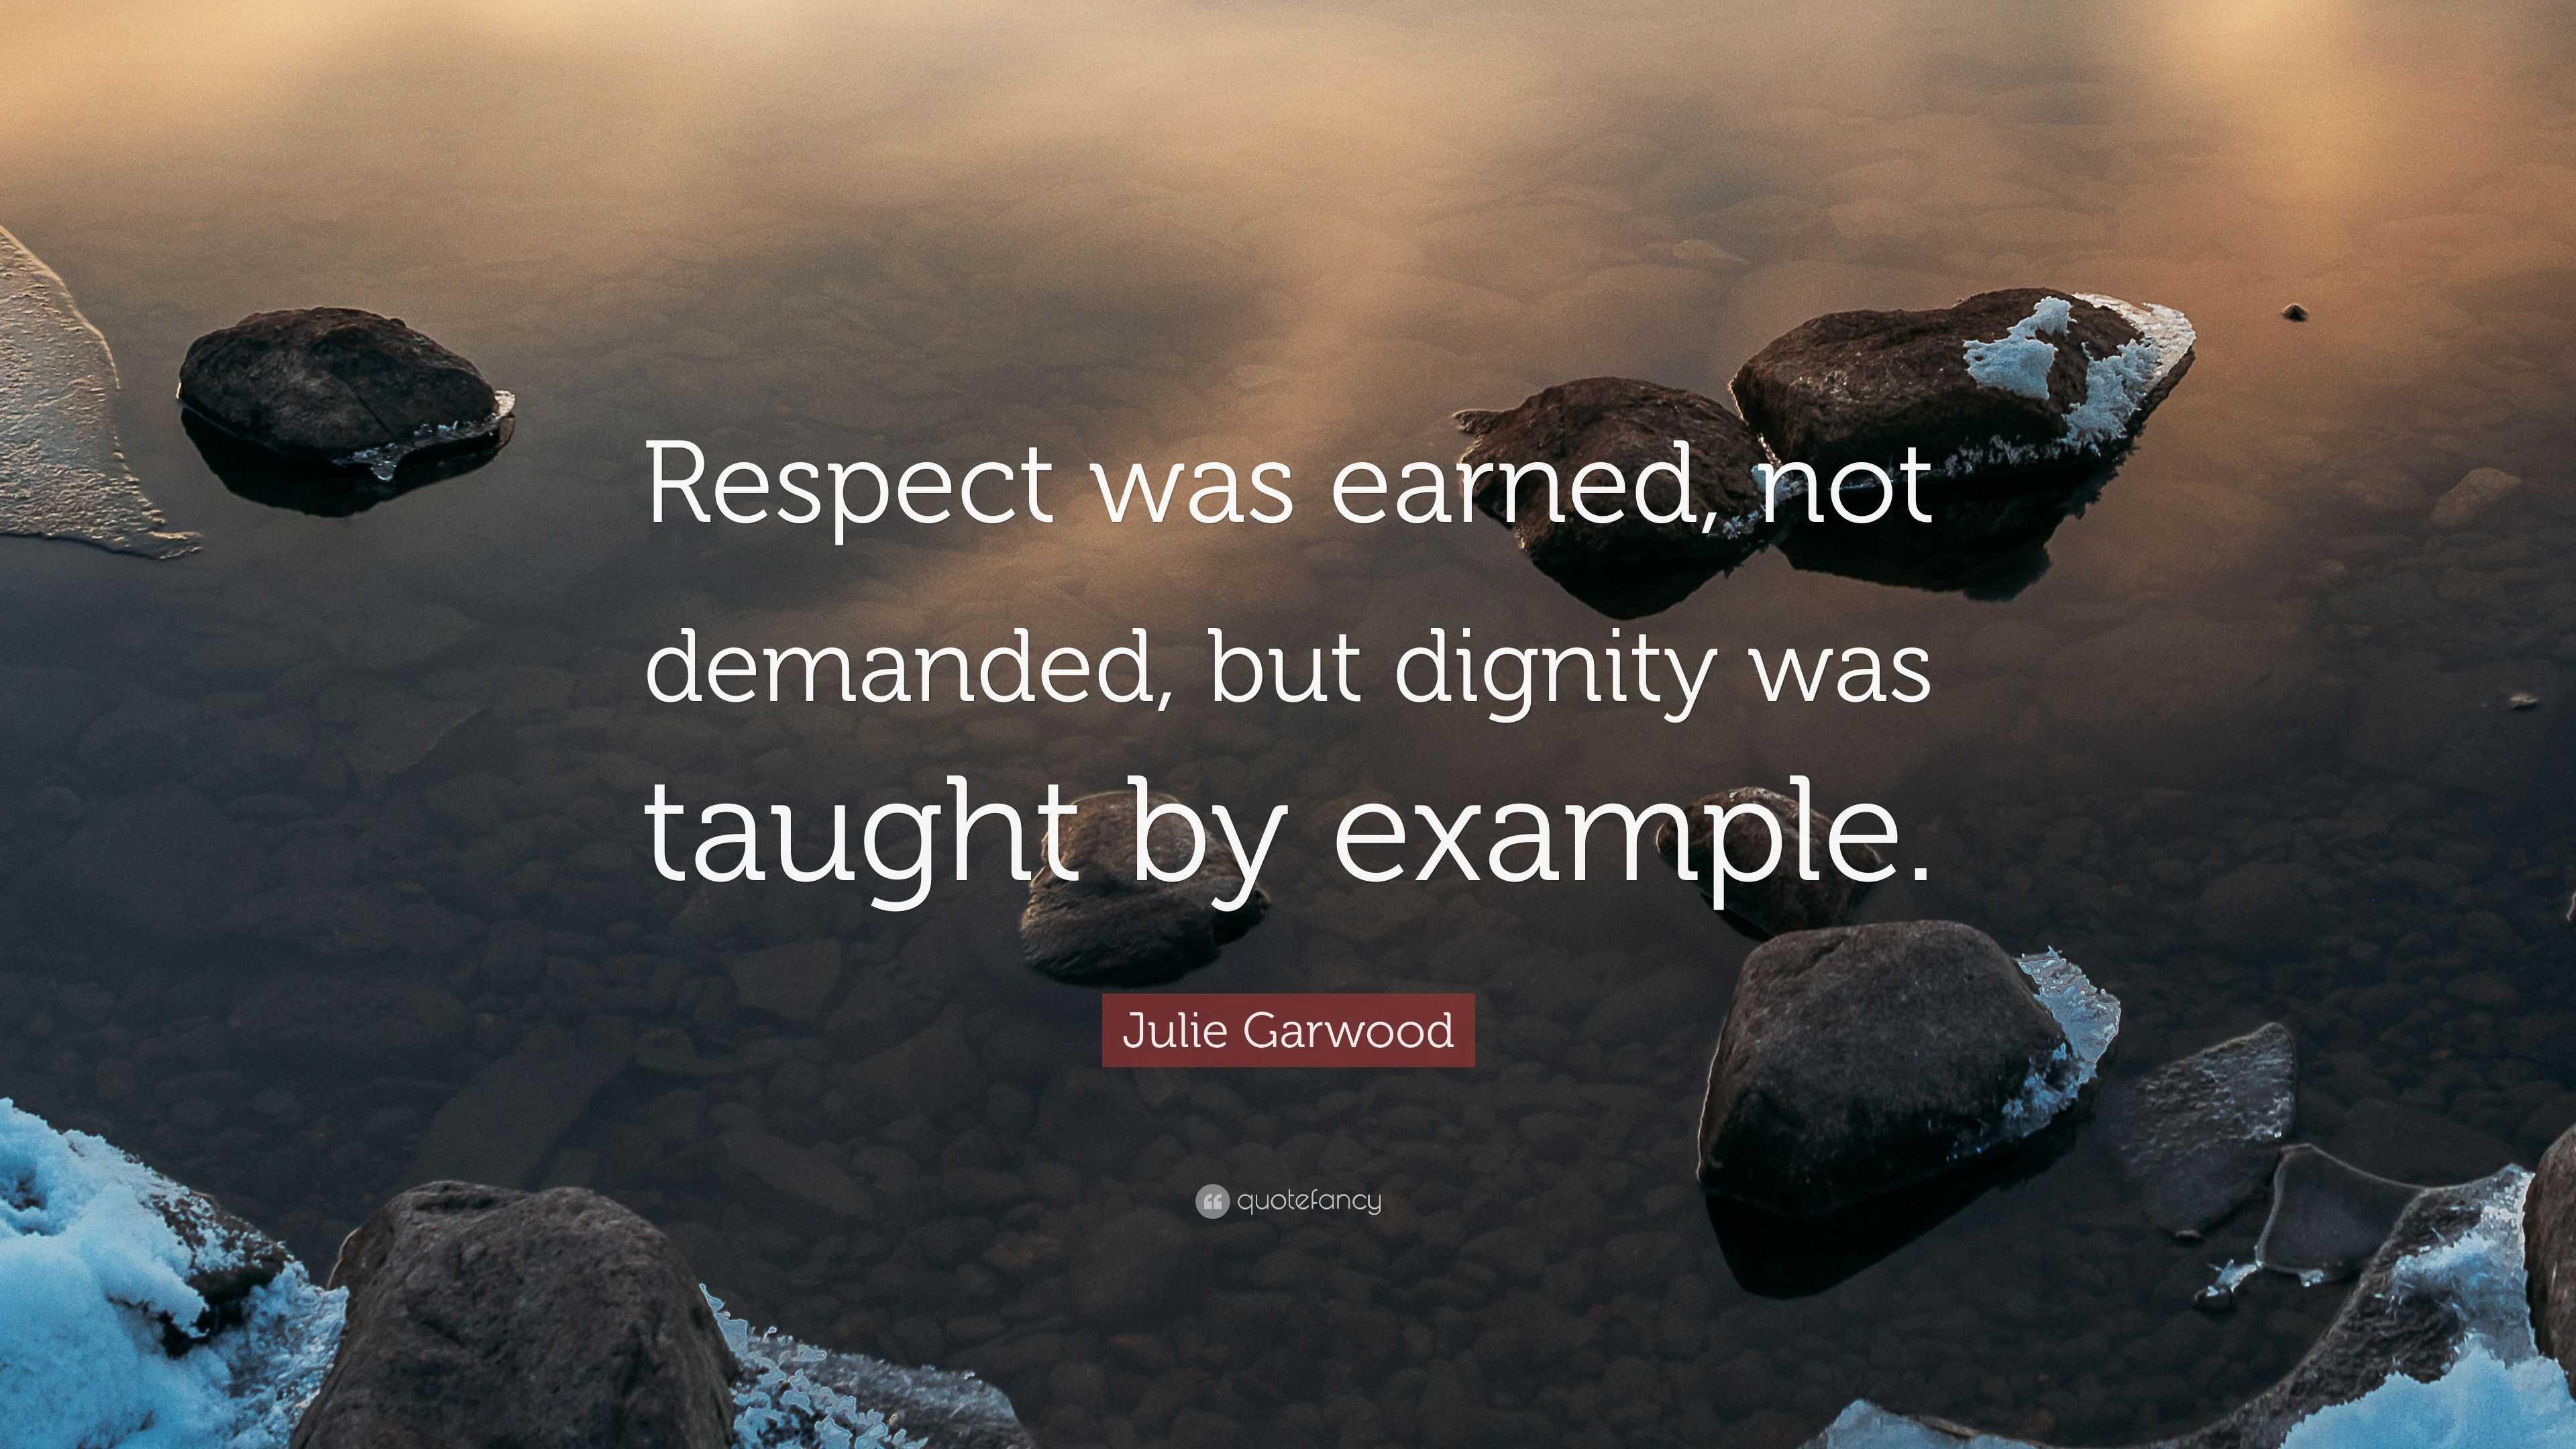 Respect better earned than demanded essay